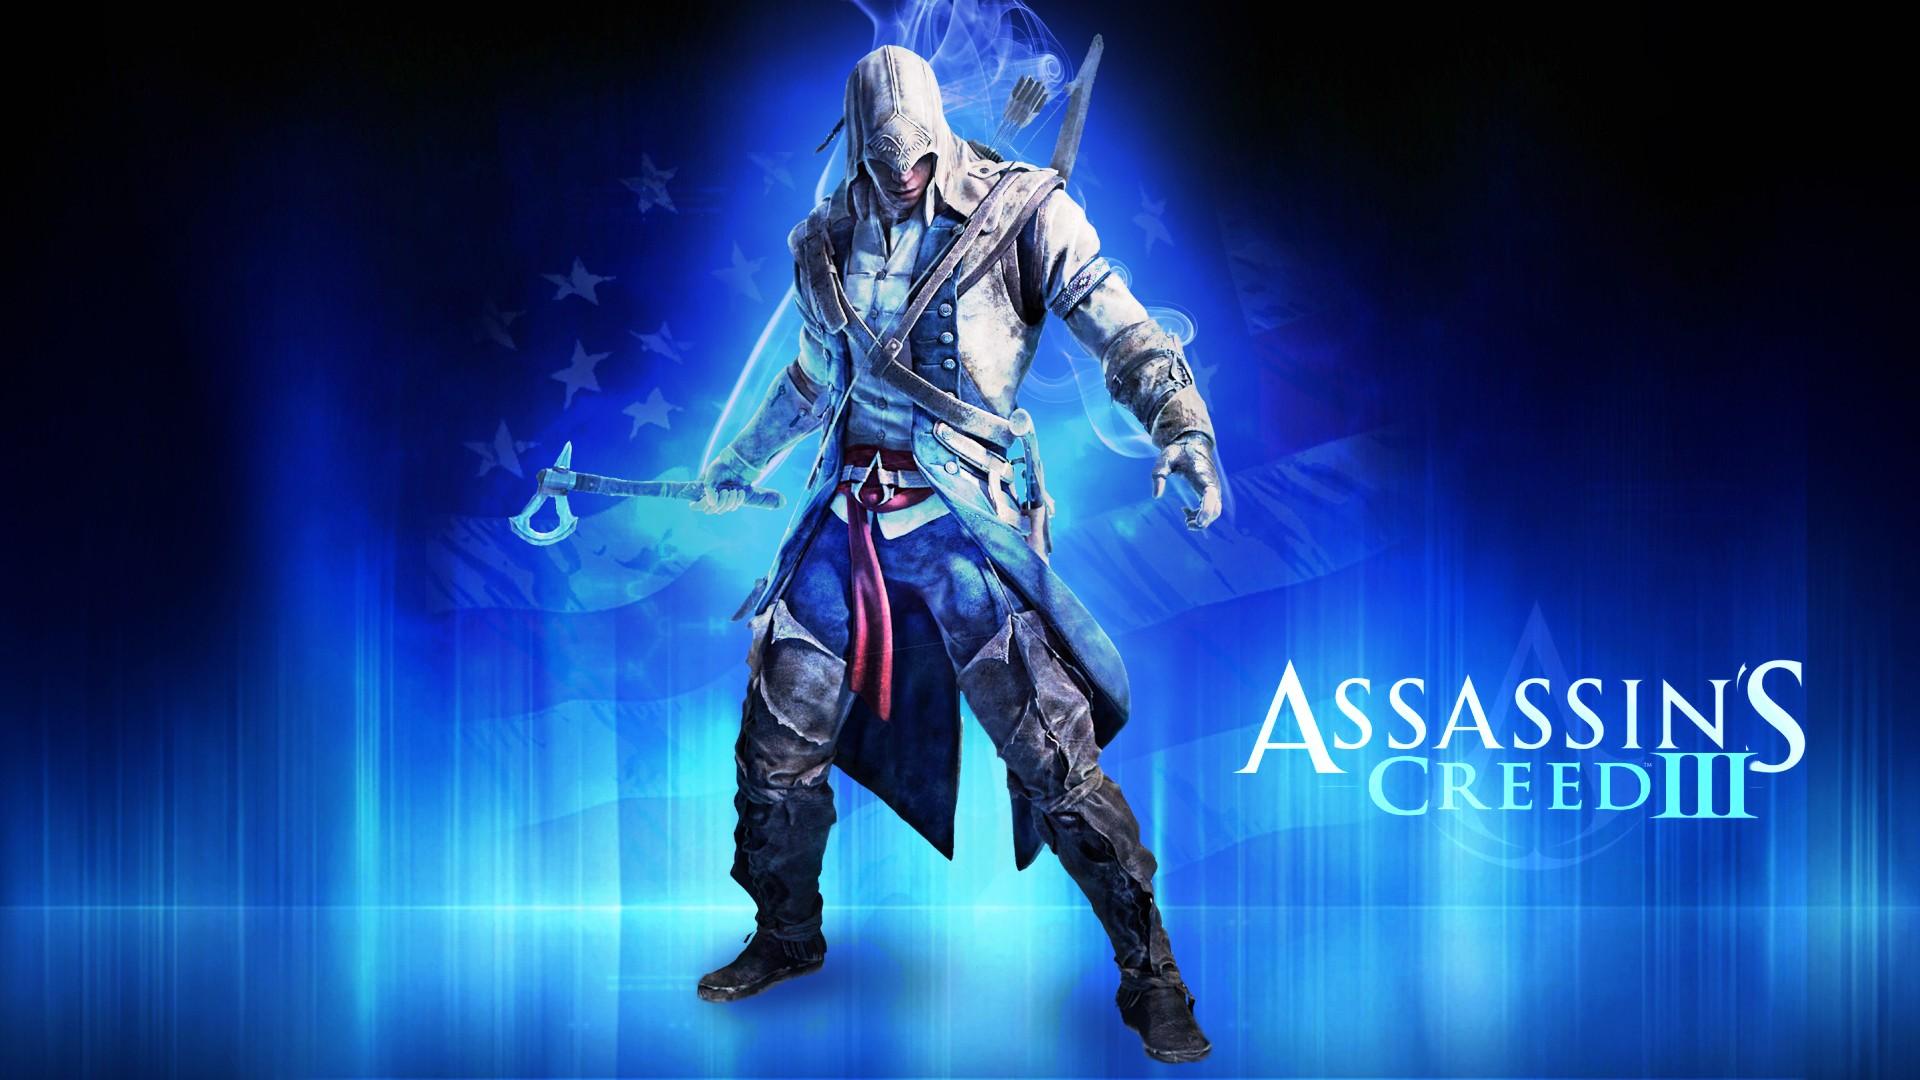 More Assassins Creed III wallpapers Assassins Creed III wallpapers 1920x1080